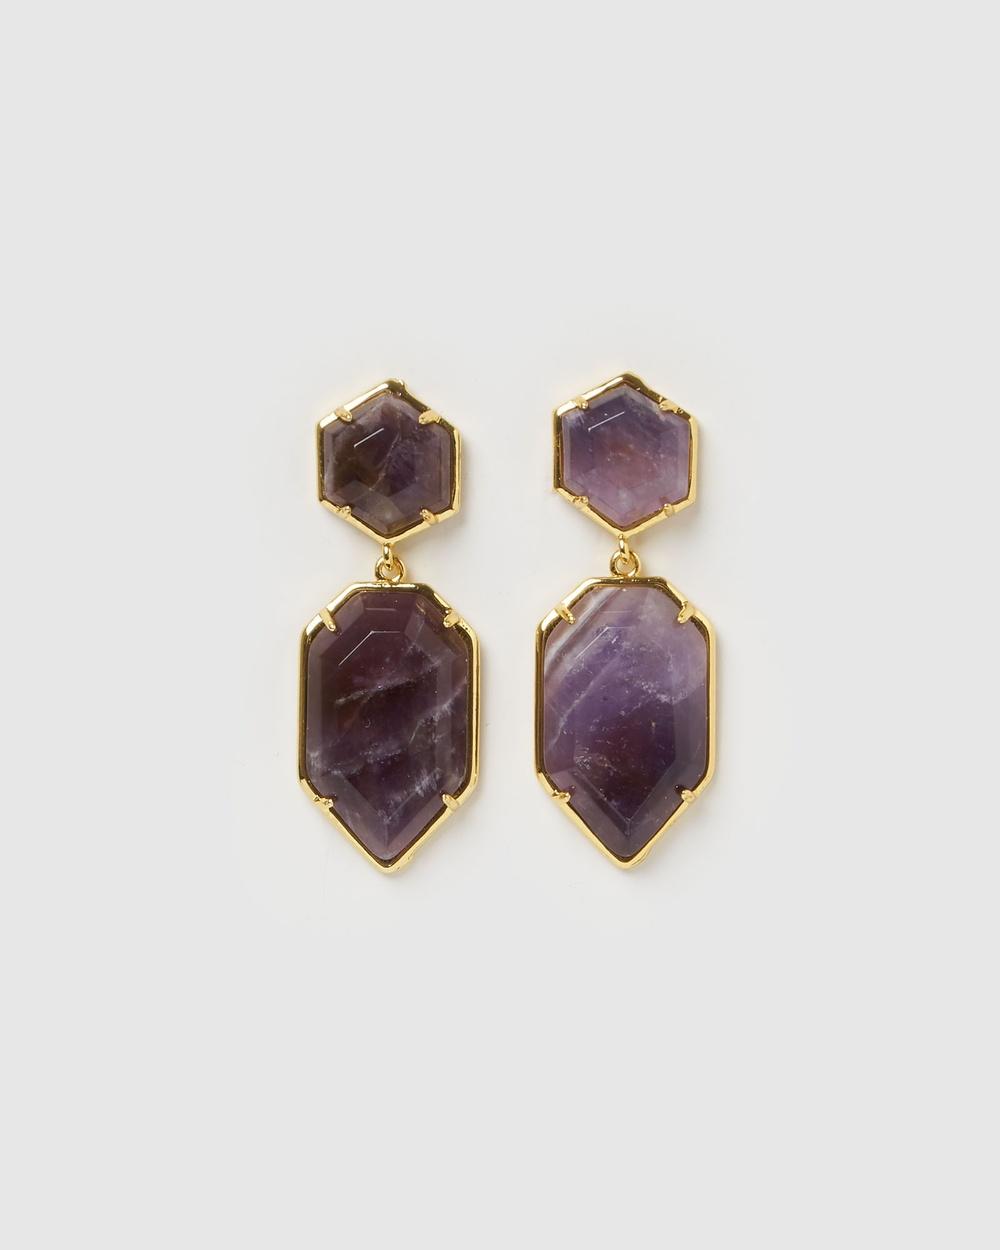 Miz Casa and Co Clementine Earrings Jewellery Amethyst Gold